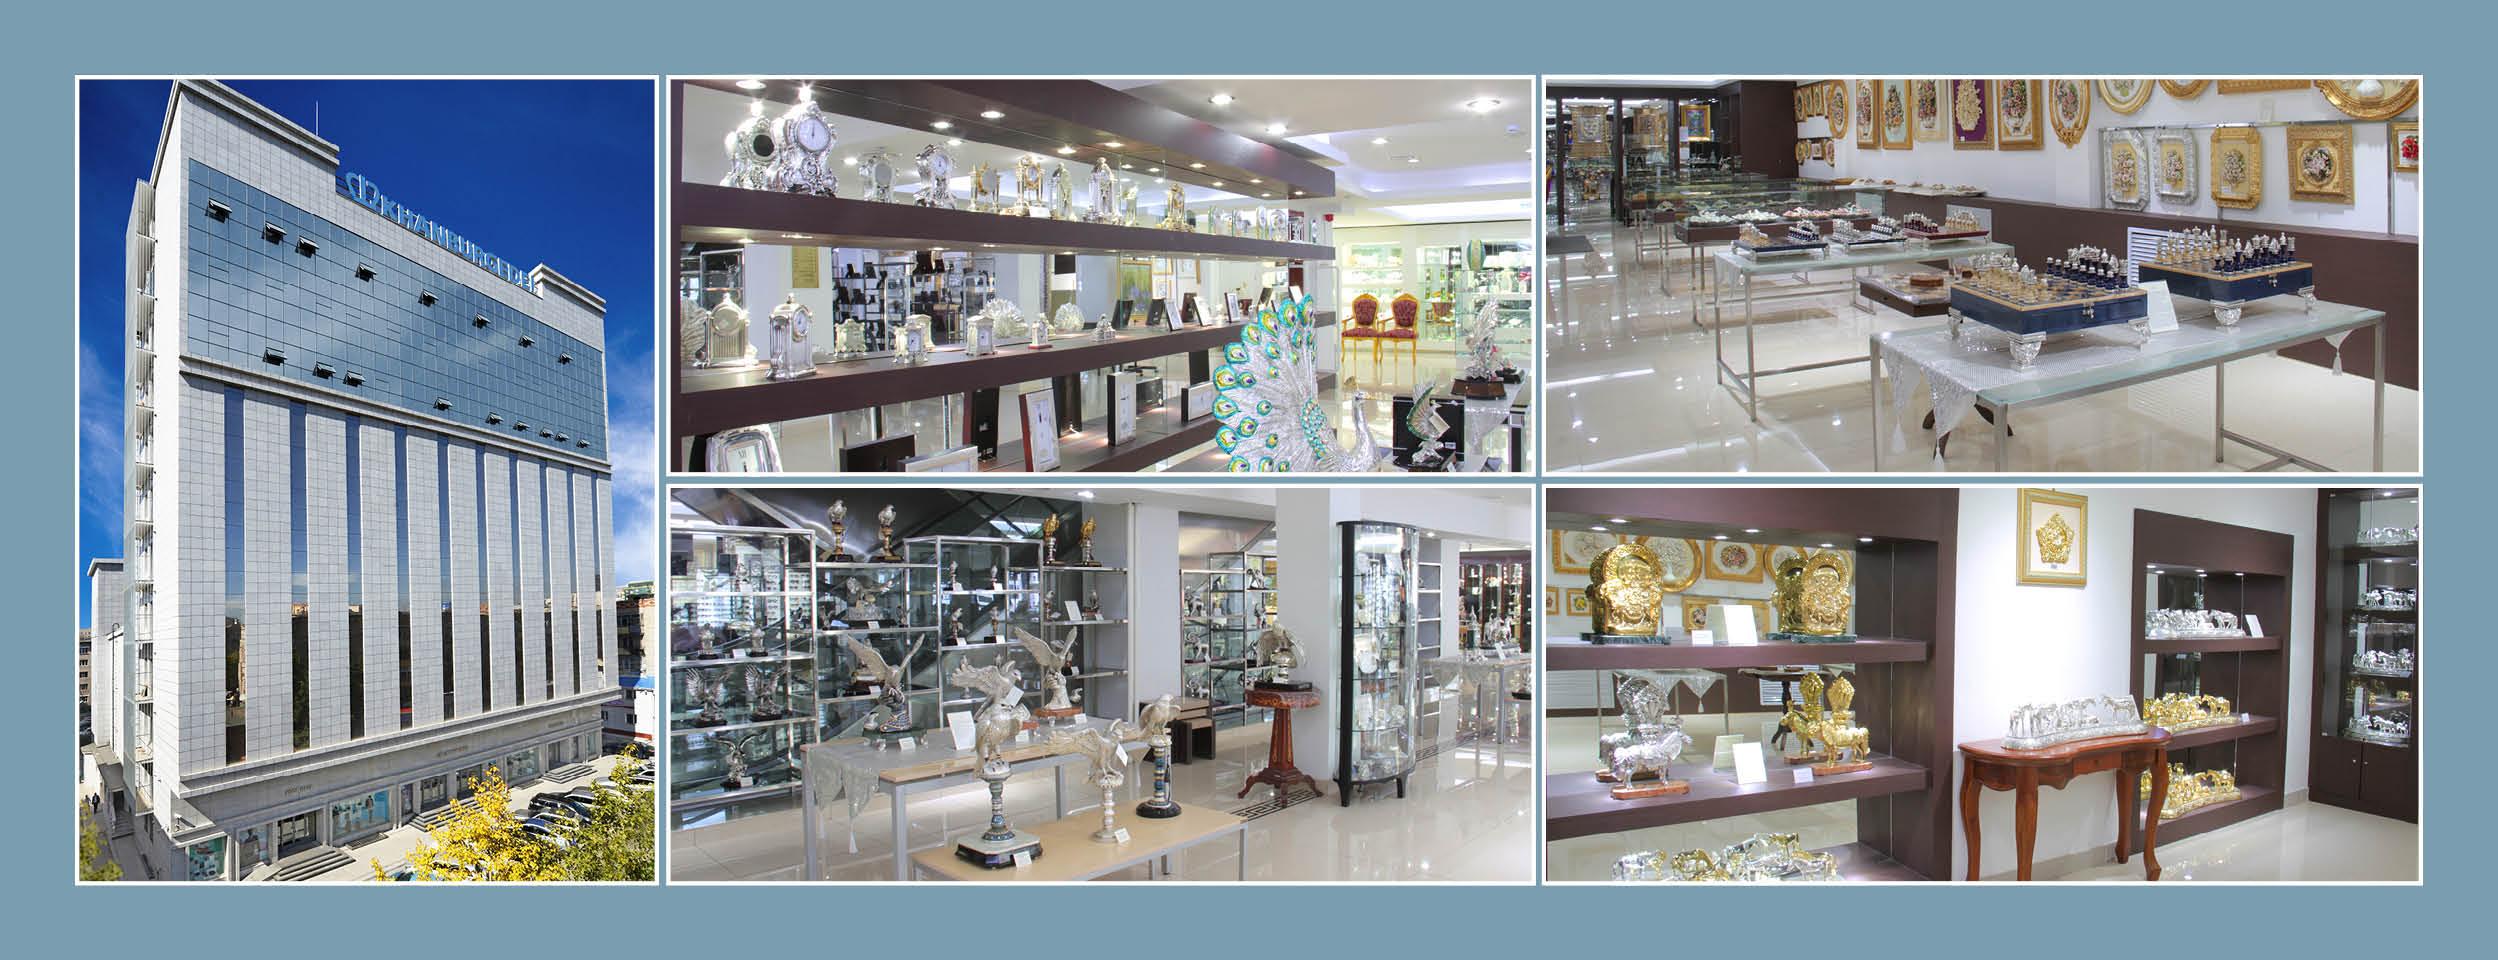 Khanburgedei Department Store's